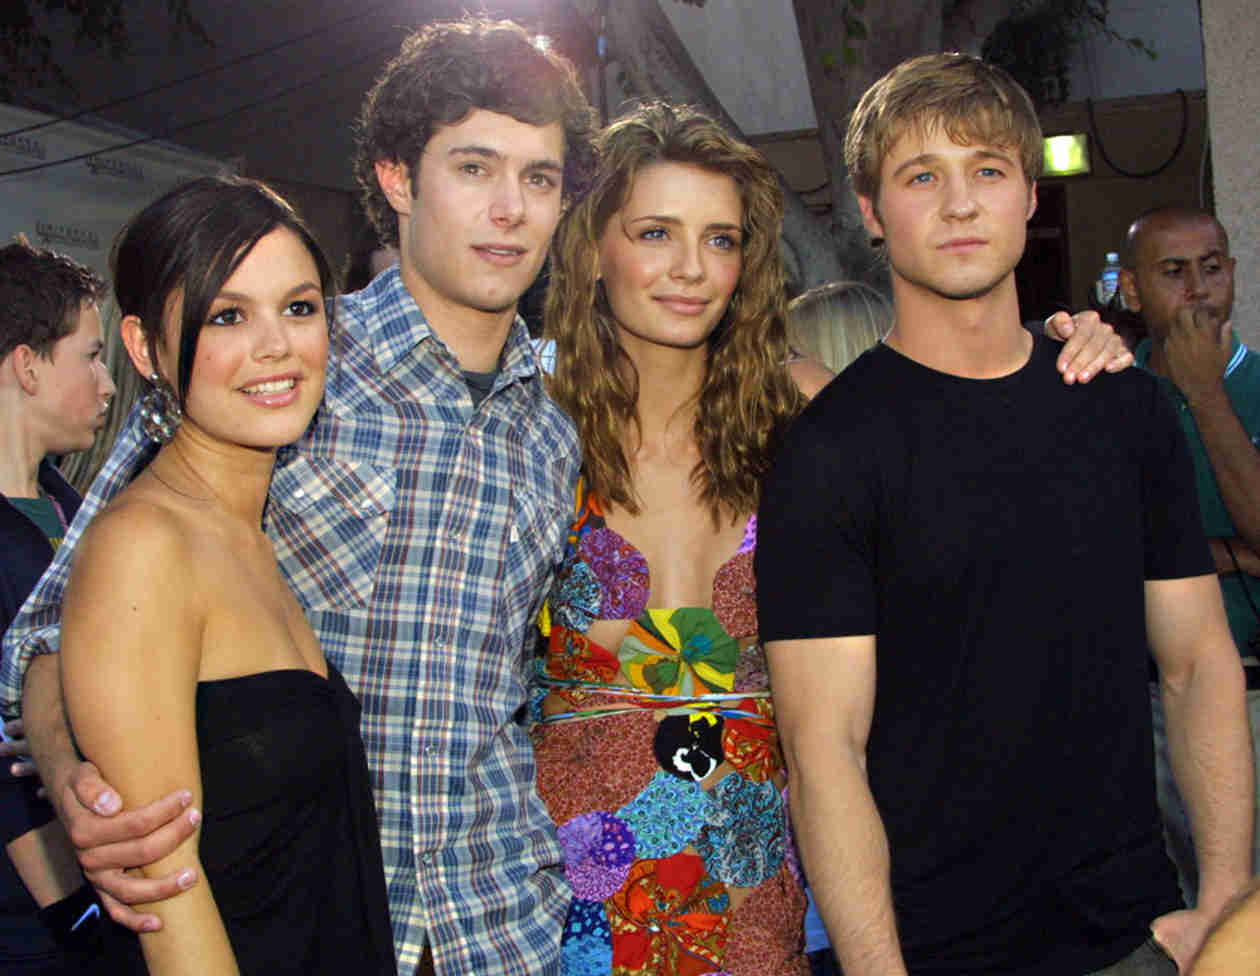 This O.C. Cast Member Wants a Reunion — Could It Happen?